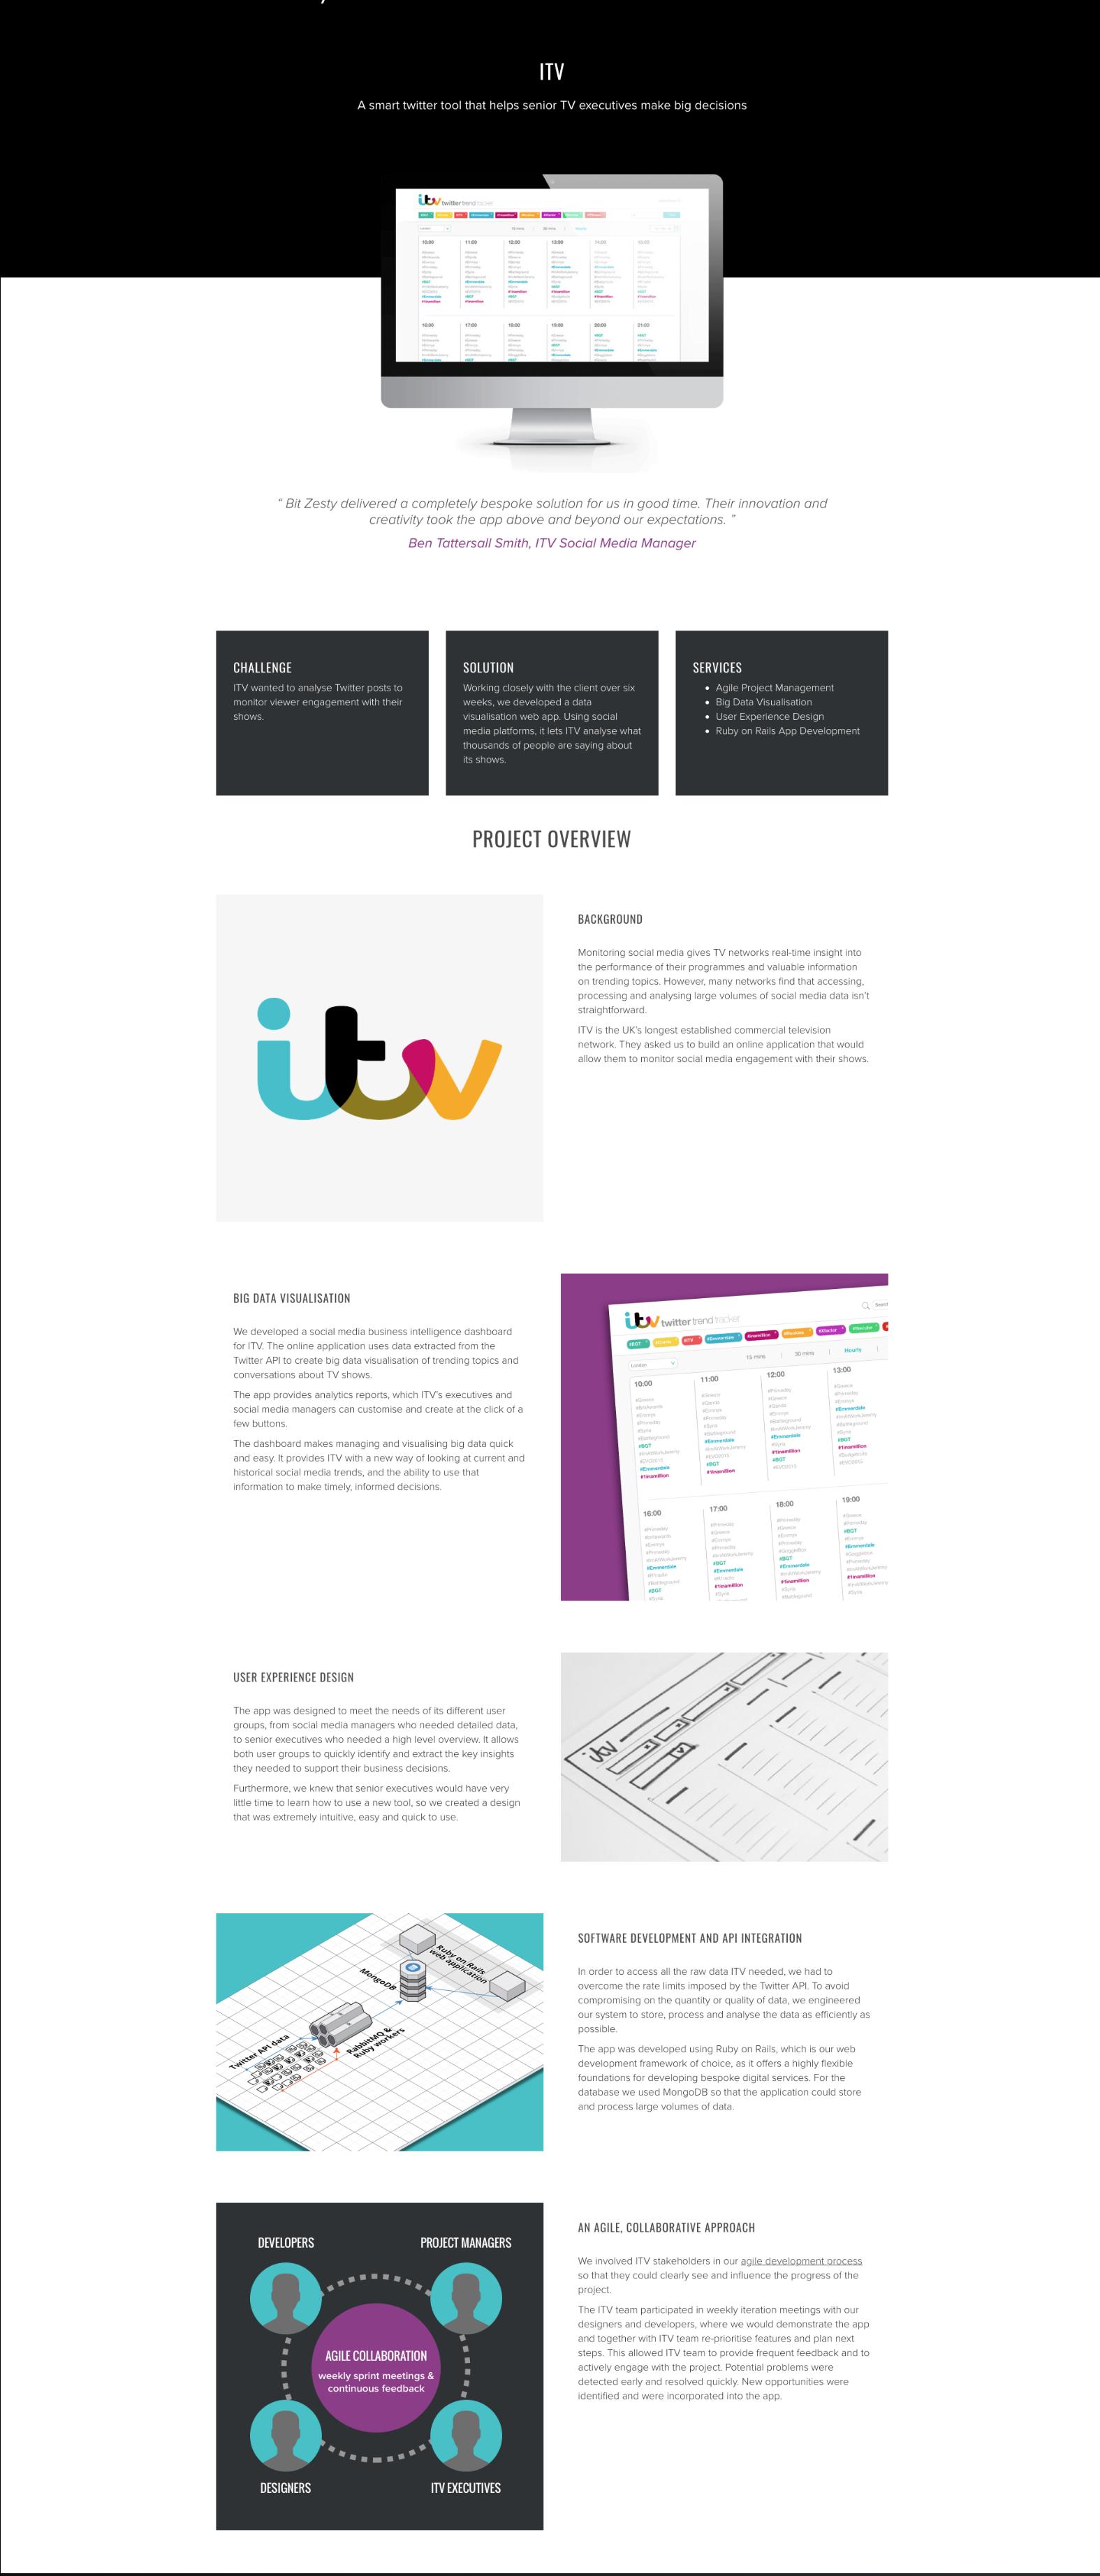 Bit Zesty ITV case study